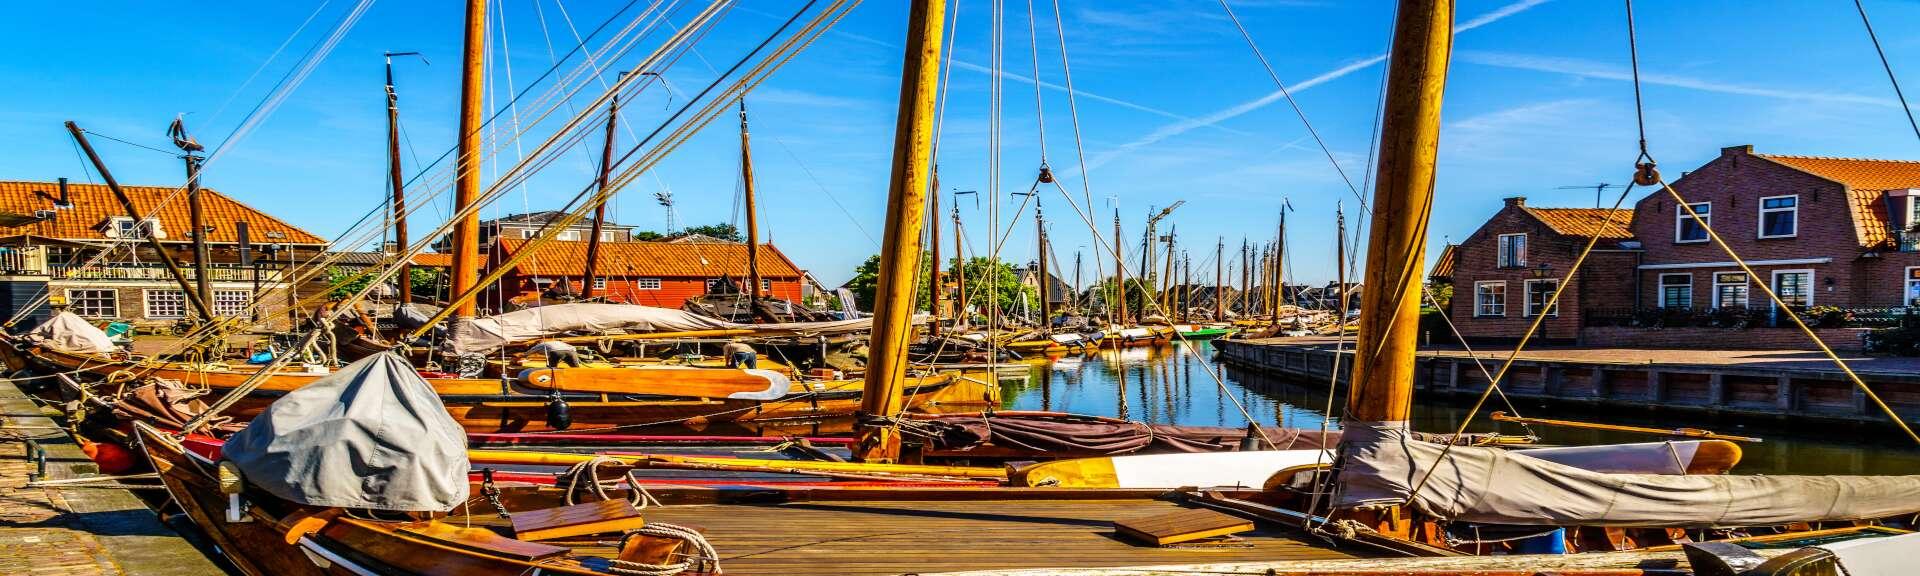 Klassenfahrt Ijsselmeer Segelboote